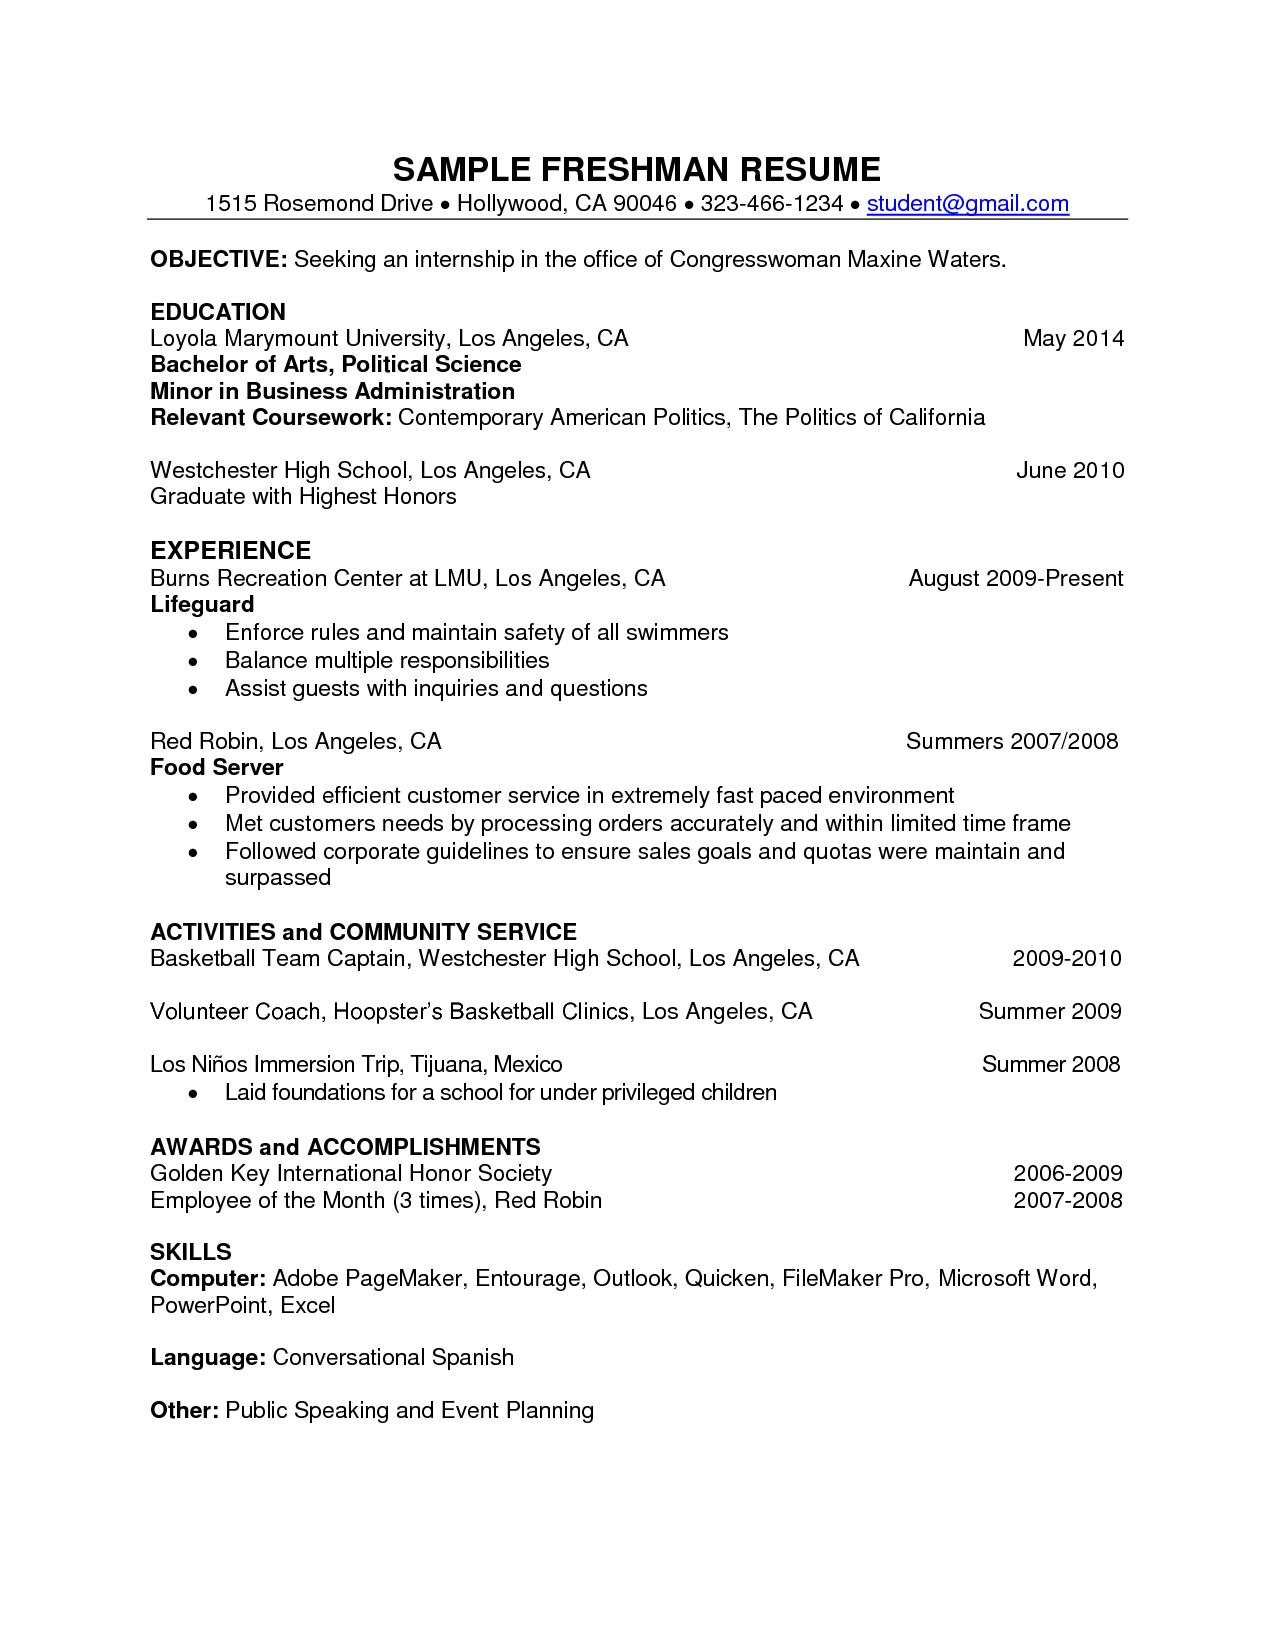 Resume Templates For Freshers Resume Writing Services Resume Writing Templates Science Internships